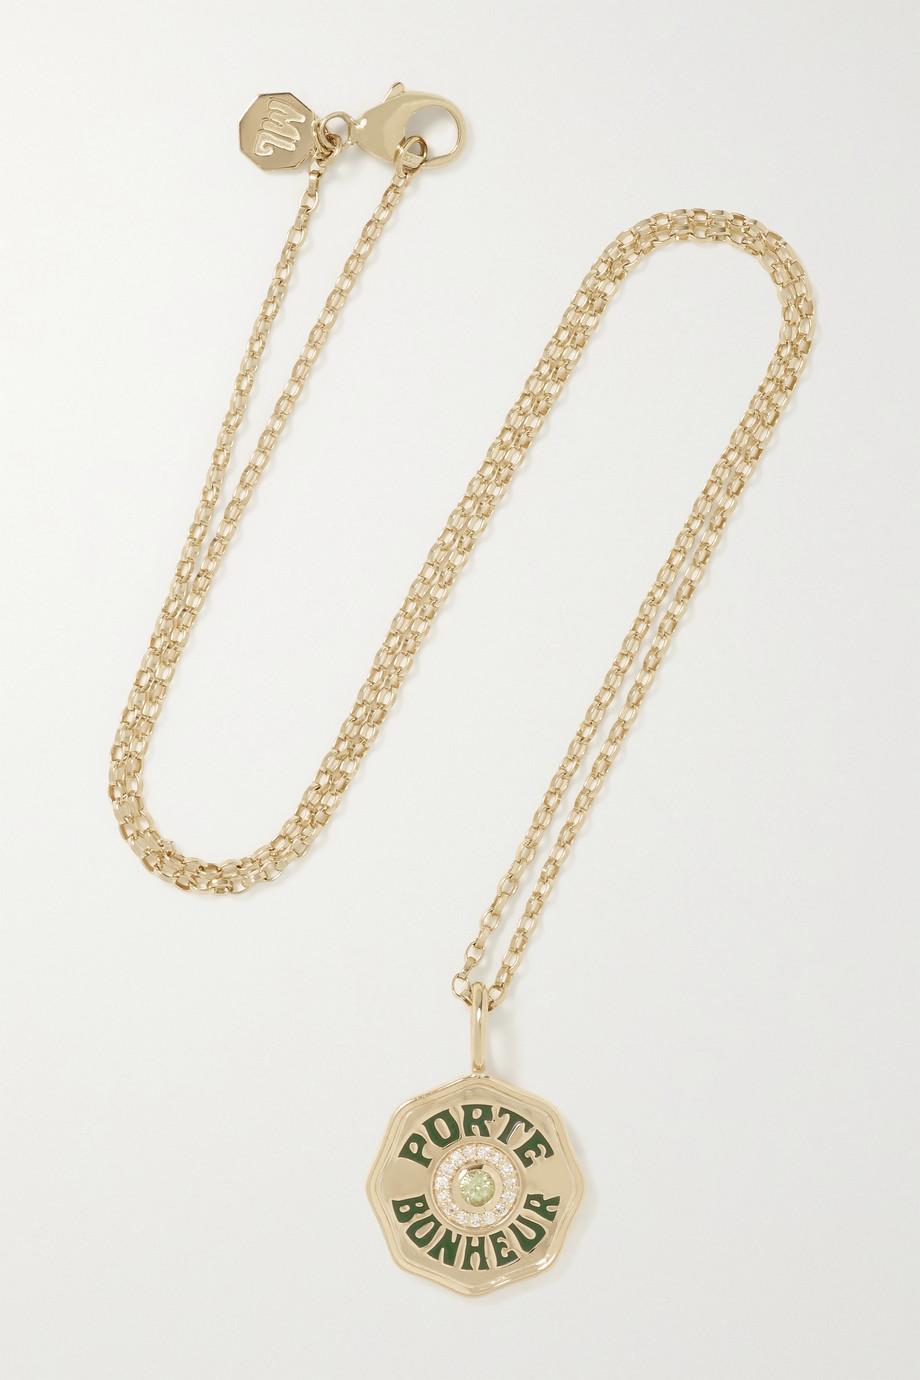 Marlo Laz Mini Porte Bonheur Coin 14-karat gold, enamel, peridot and diamond necklace